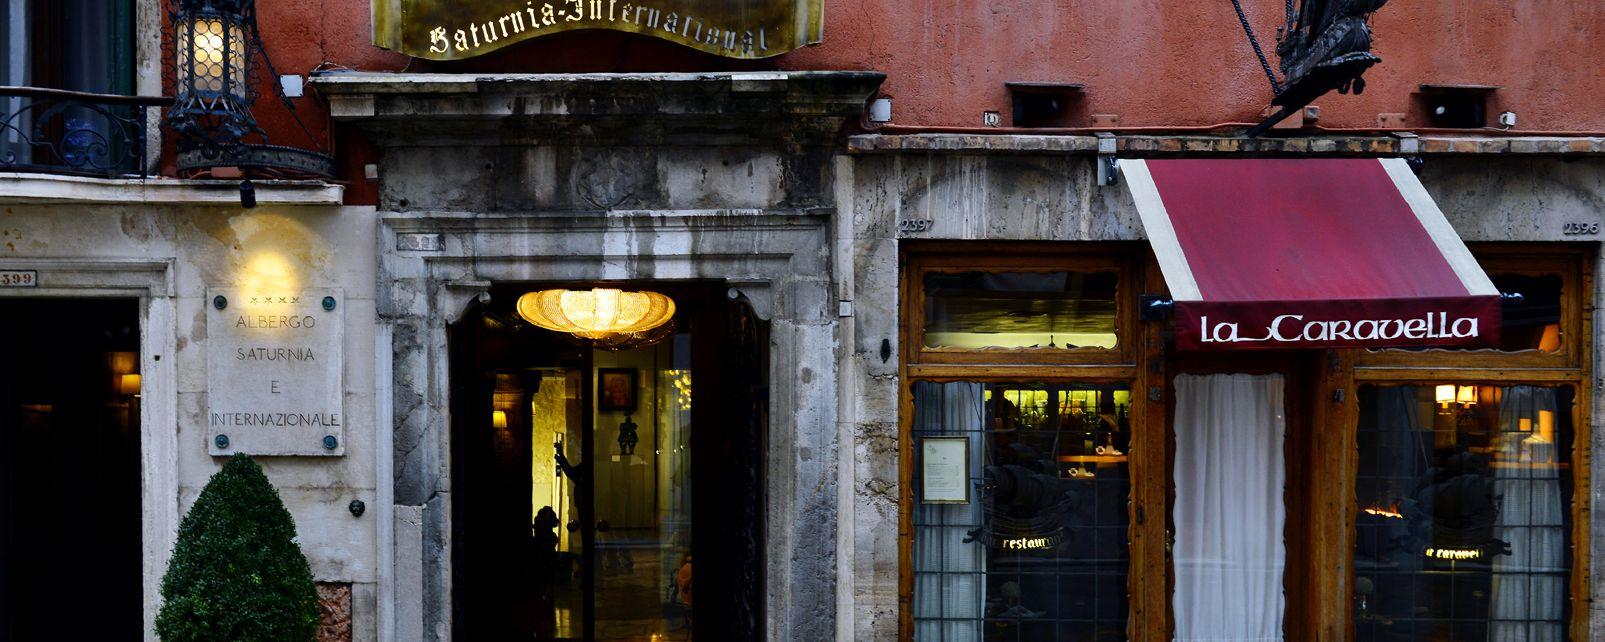 Hotel Saturnia International Venezia